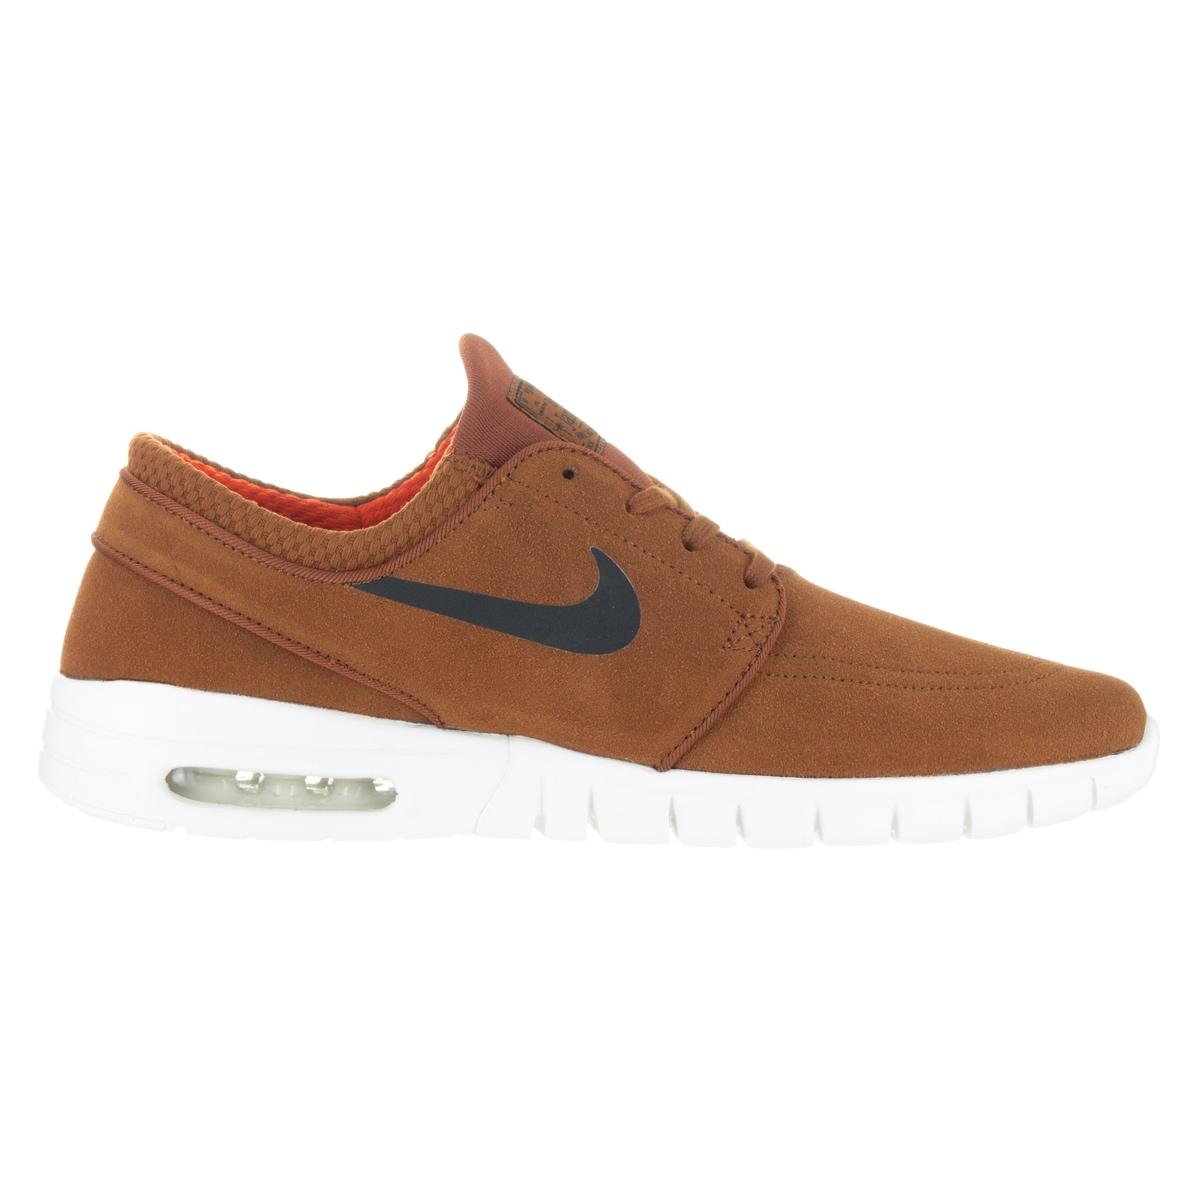 Nike Men's Stefan Janoski Max L HazelnutBlackIvoryClay Orange Skate Shoes